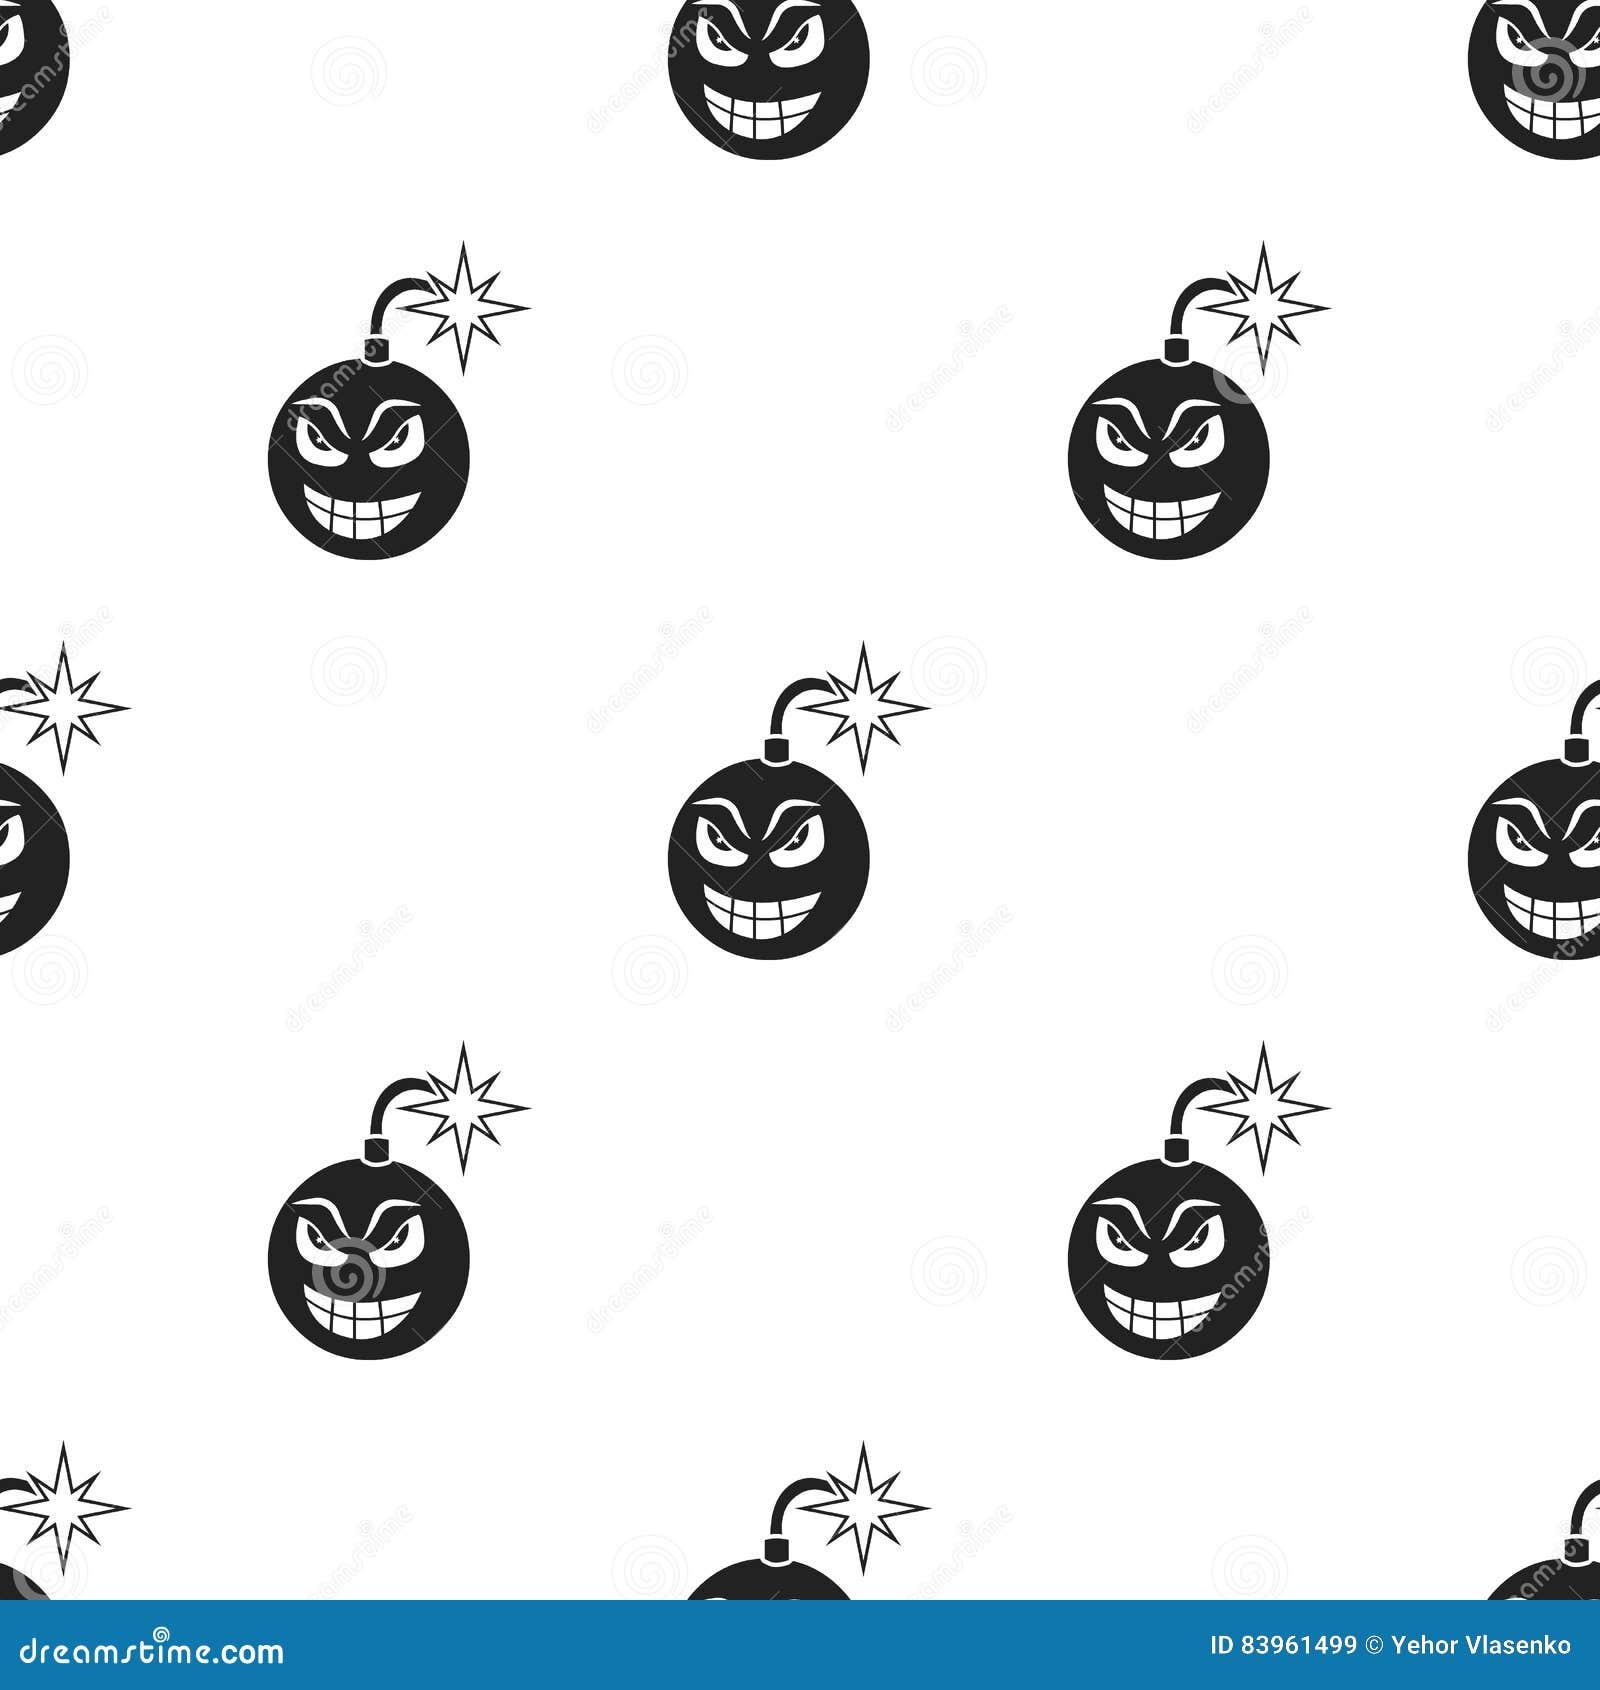 Bomb Virus Icon In Cartoon Style Isolated On White